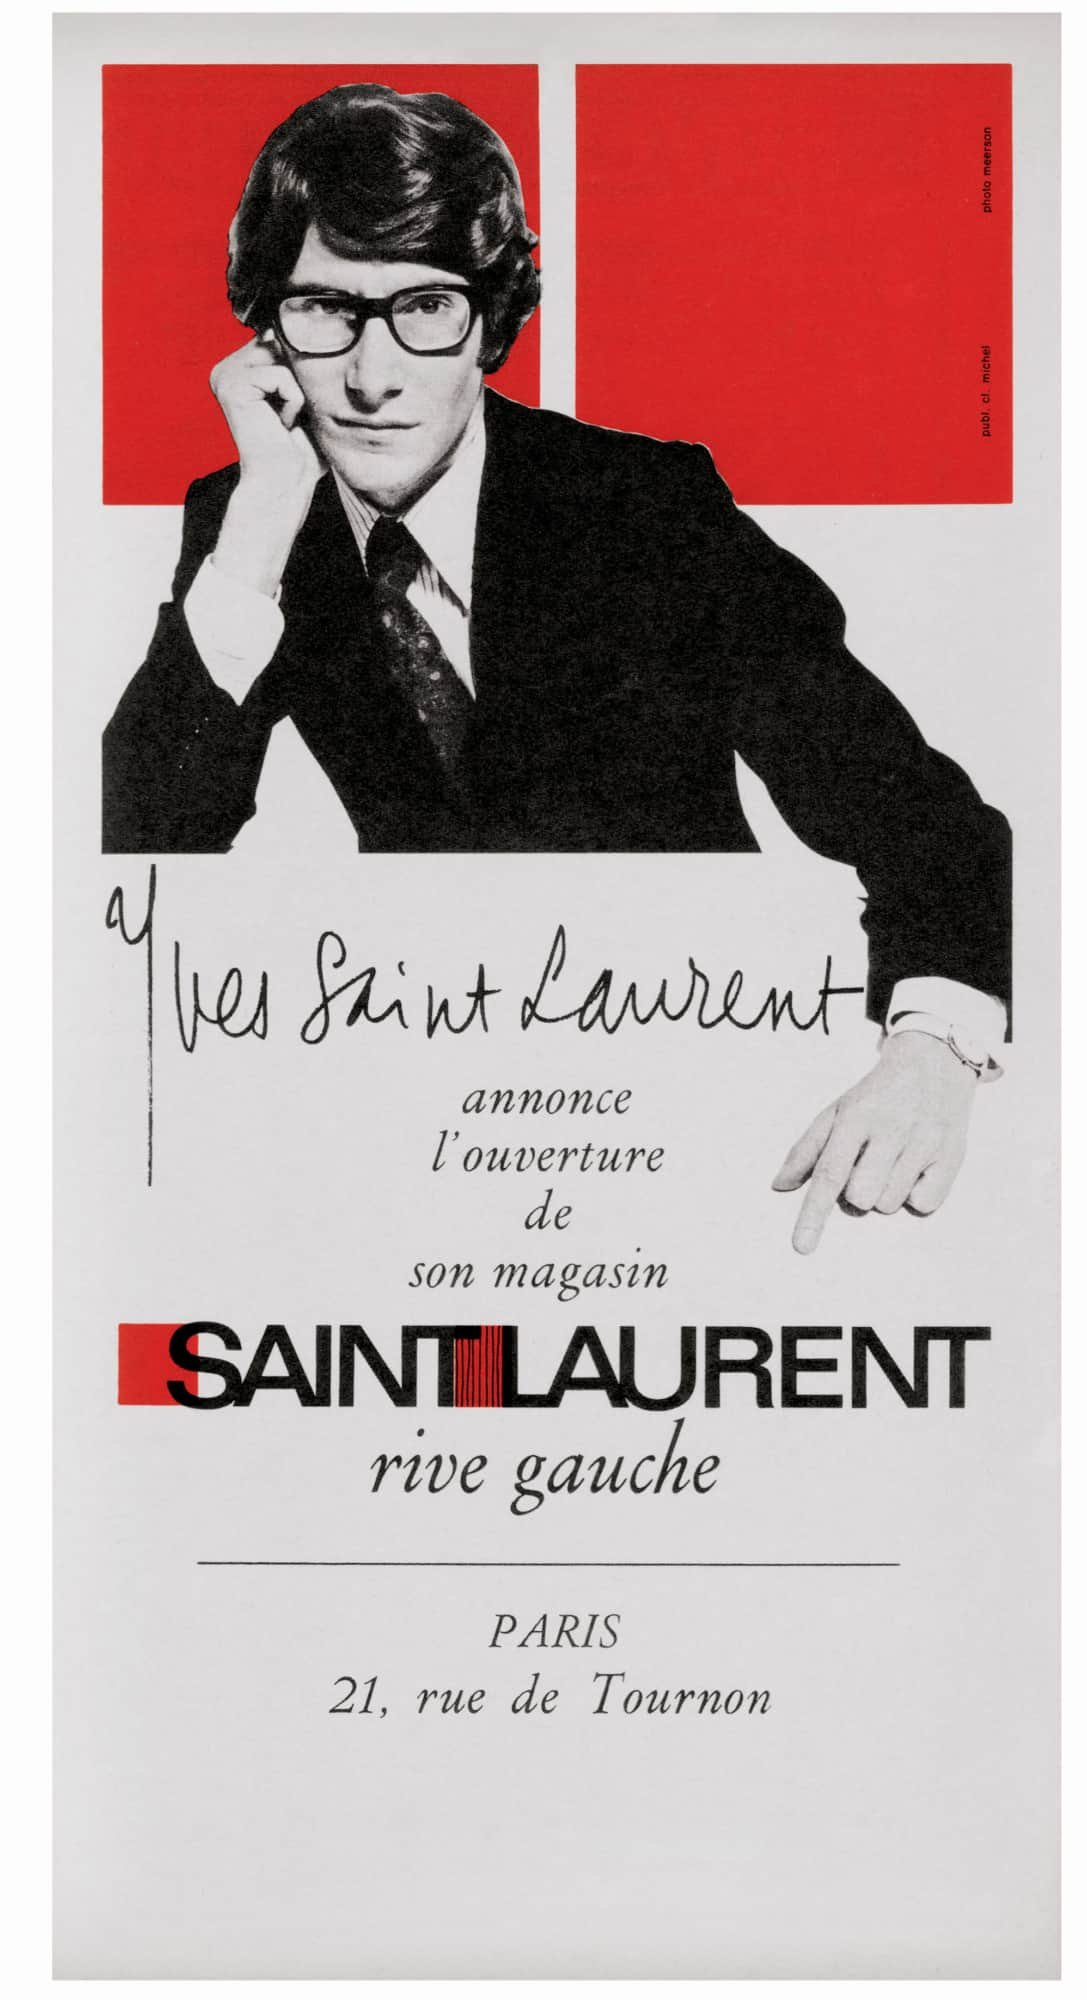 SAINT LAURENT rive gauche logo del 1966